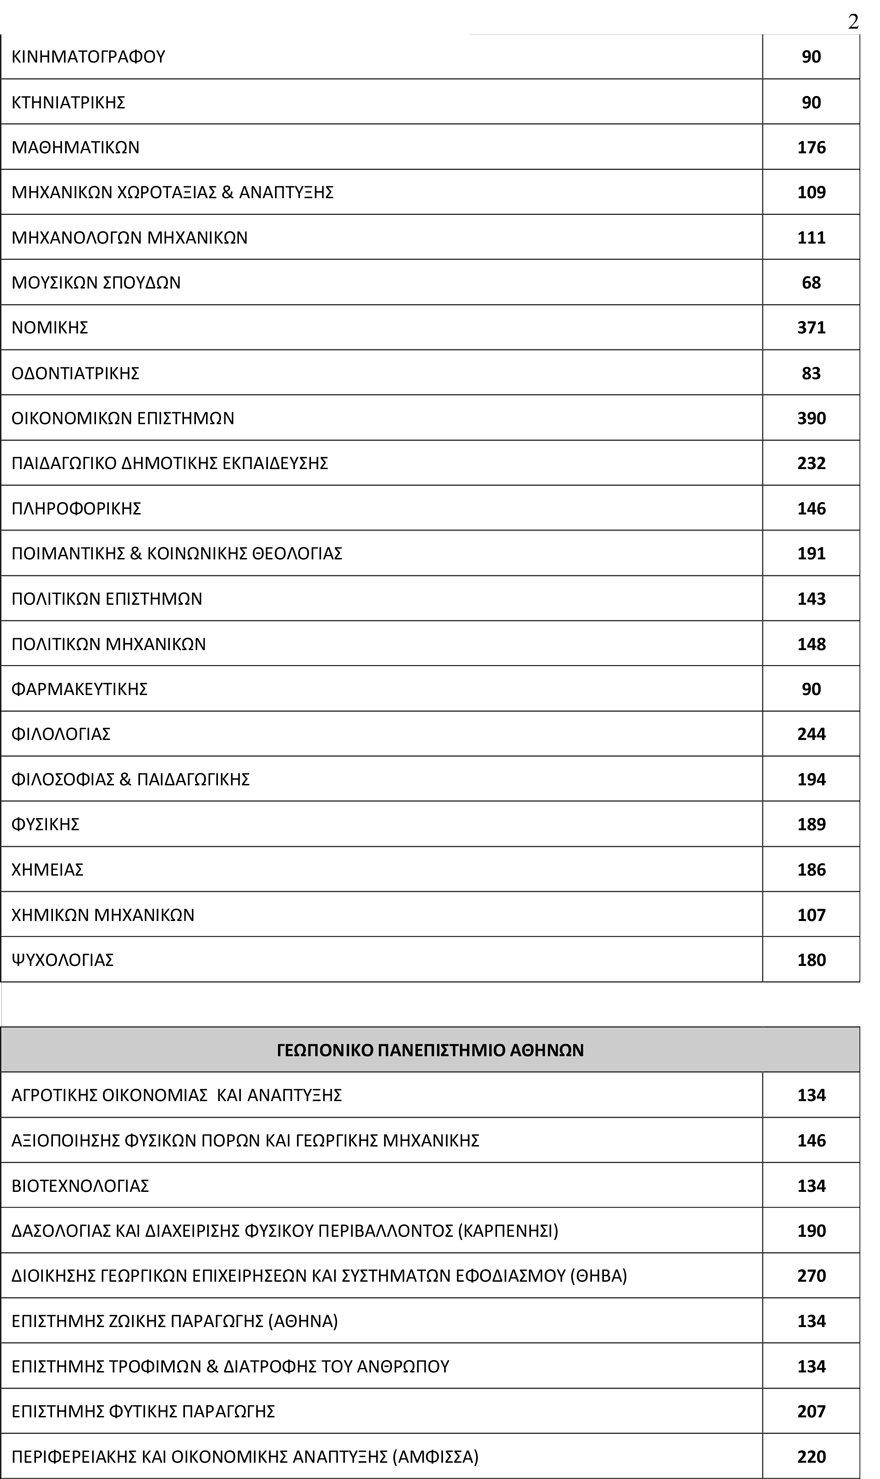 arrithmos_eisakt2 78.335 θα εισαχθούν φέτος στα Πανεπιστήμια - Αυξημένος κατά 3.500 ο αριθμός